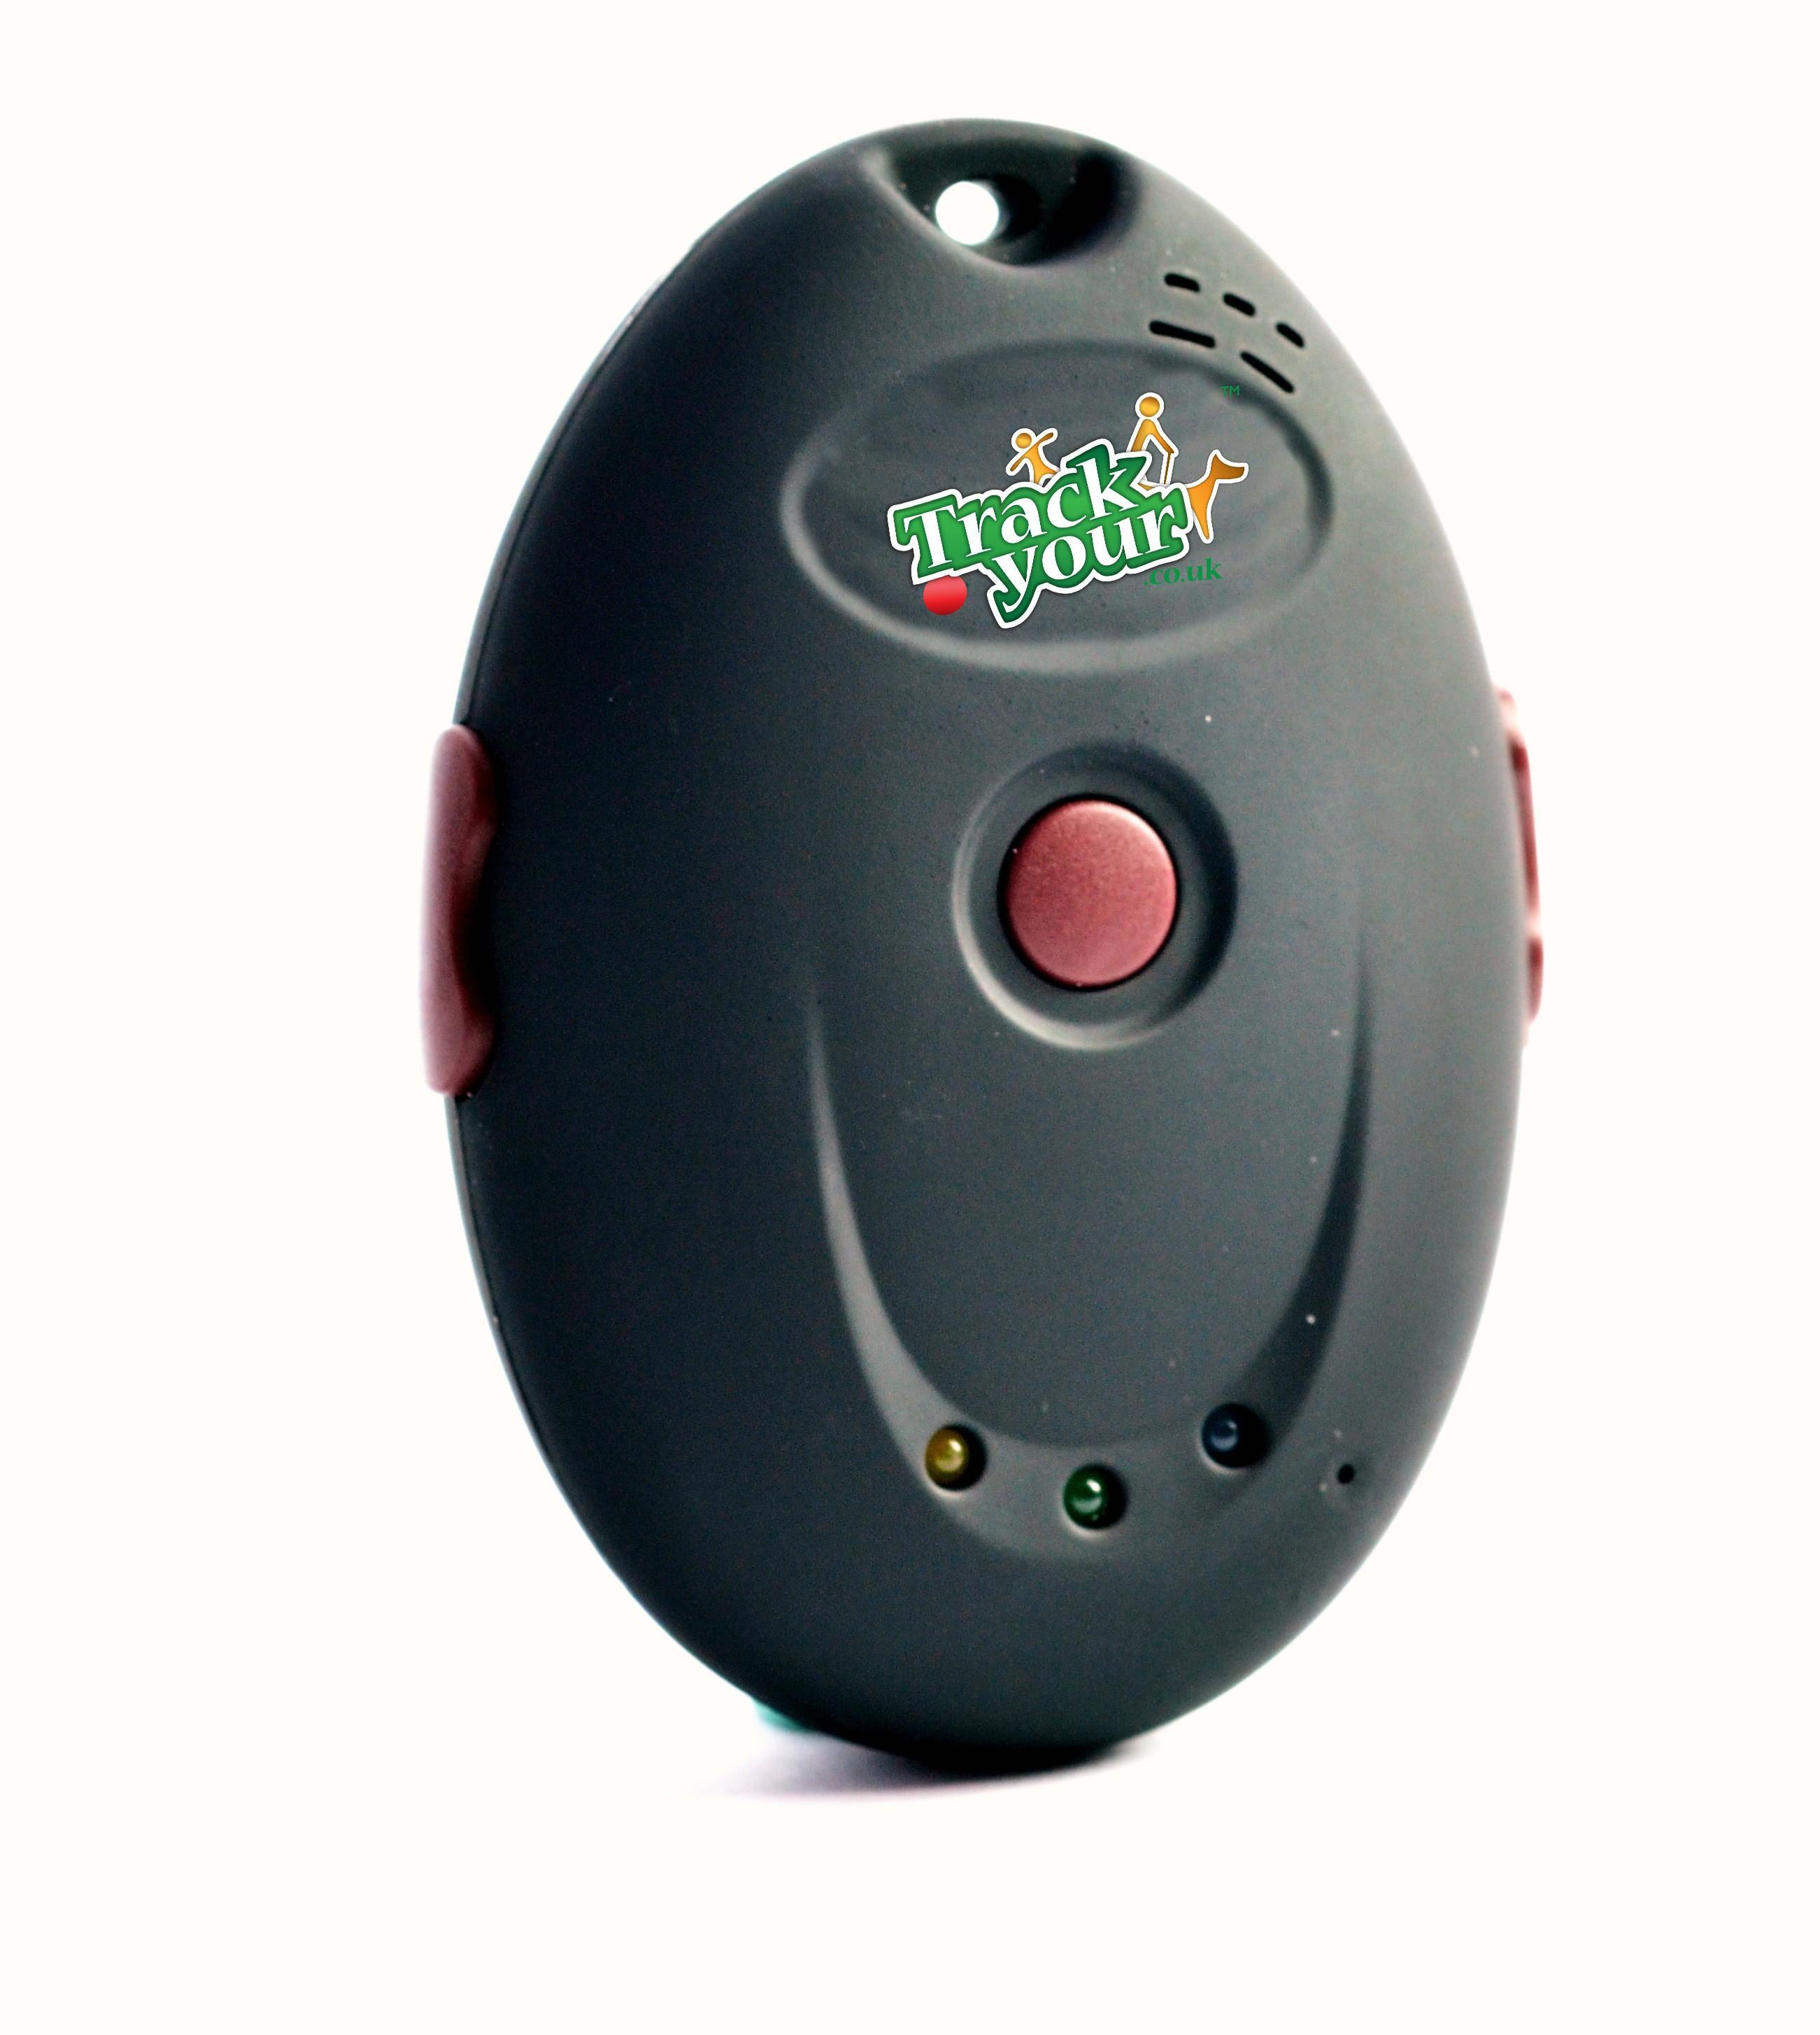 2-Way Talk / SOS Dementia GPS Tracker TY107